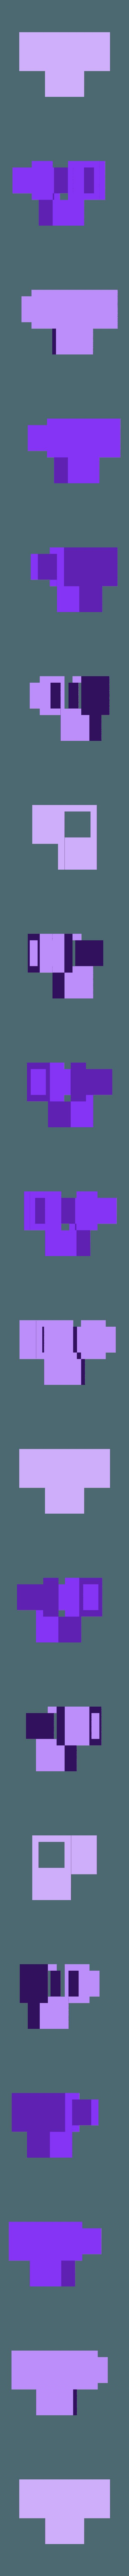 Porte_pots_de_fleurs_fen%C3%AAtre_-_Double_T_90.stl Download free STL file Flowerpot holder / Flowerpot holder • 3D print object, BakoProductions